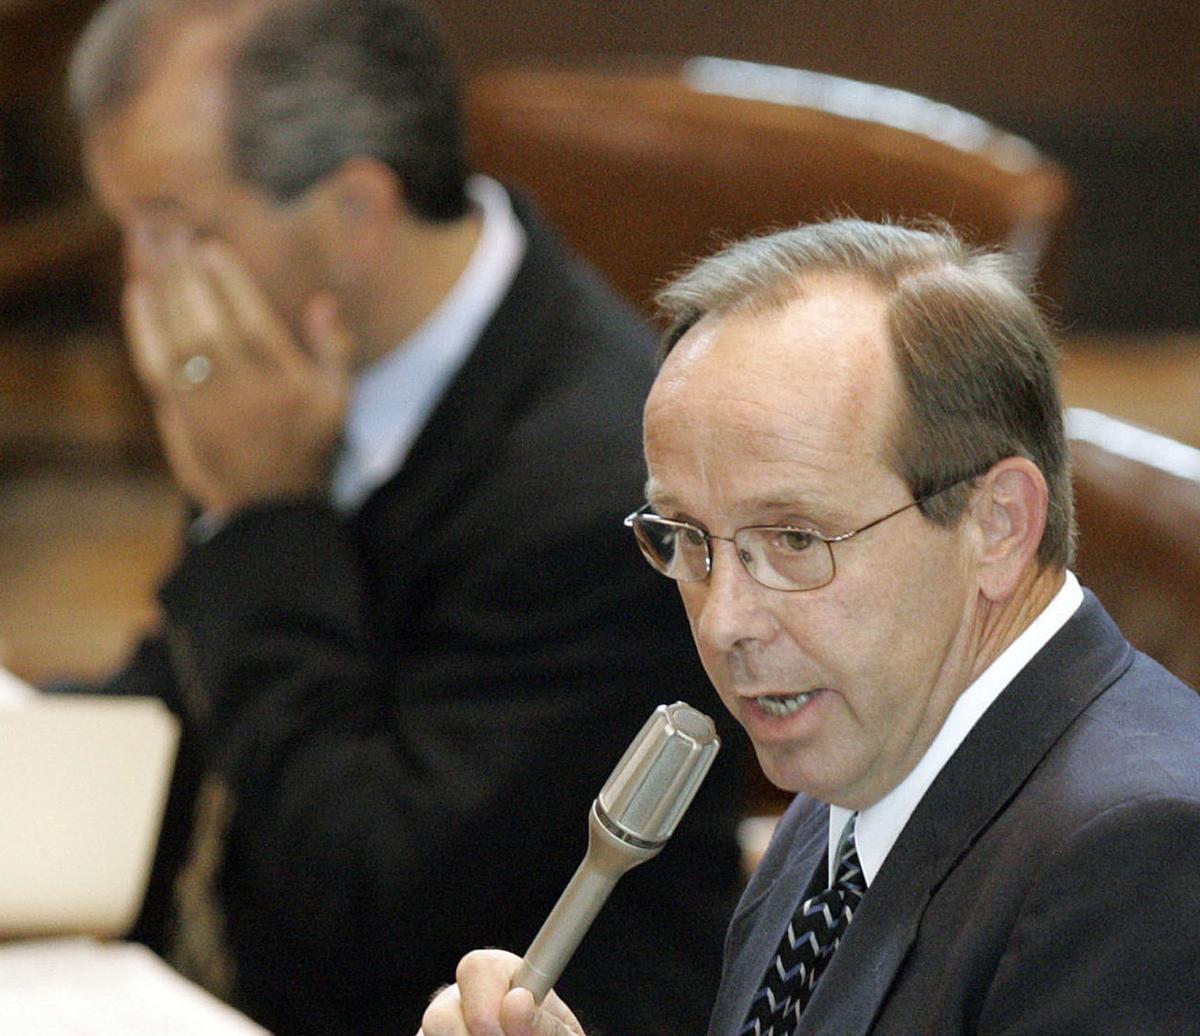 State Senator Sexual Misconduct